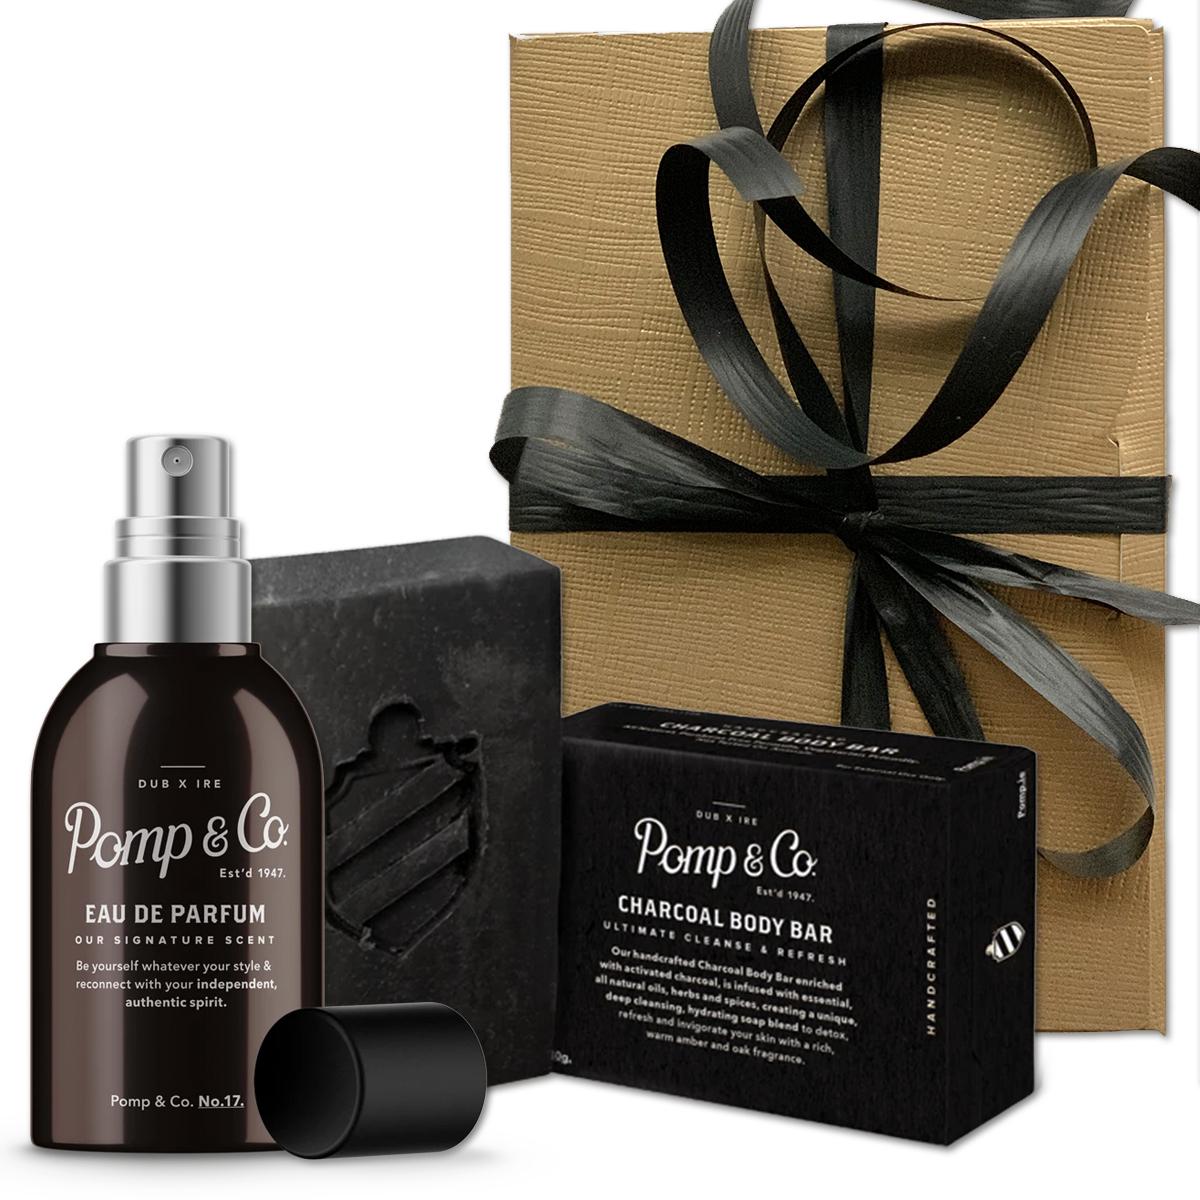 Tuotekuva: Pomp&Co. tuoksu & saippua lahjasetti